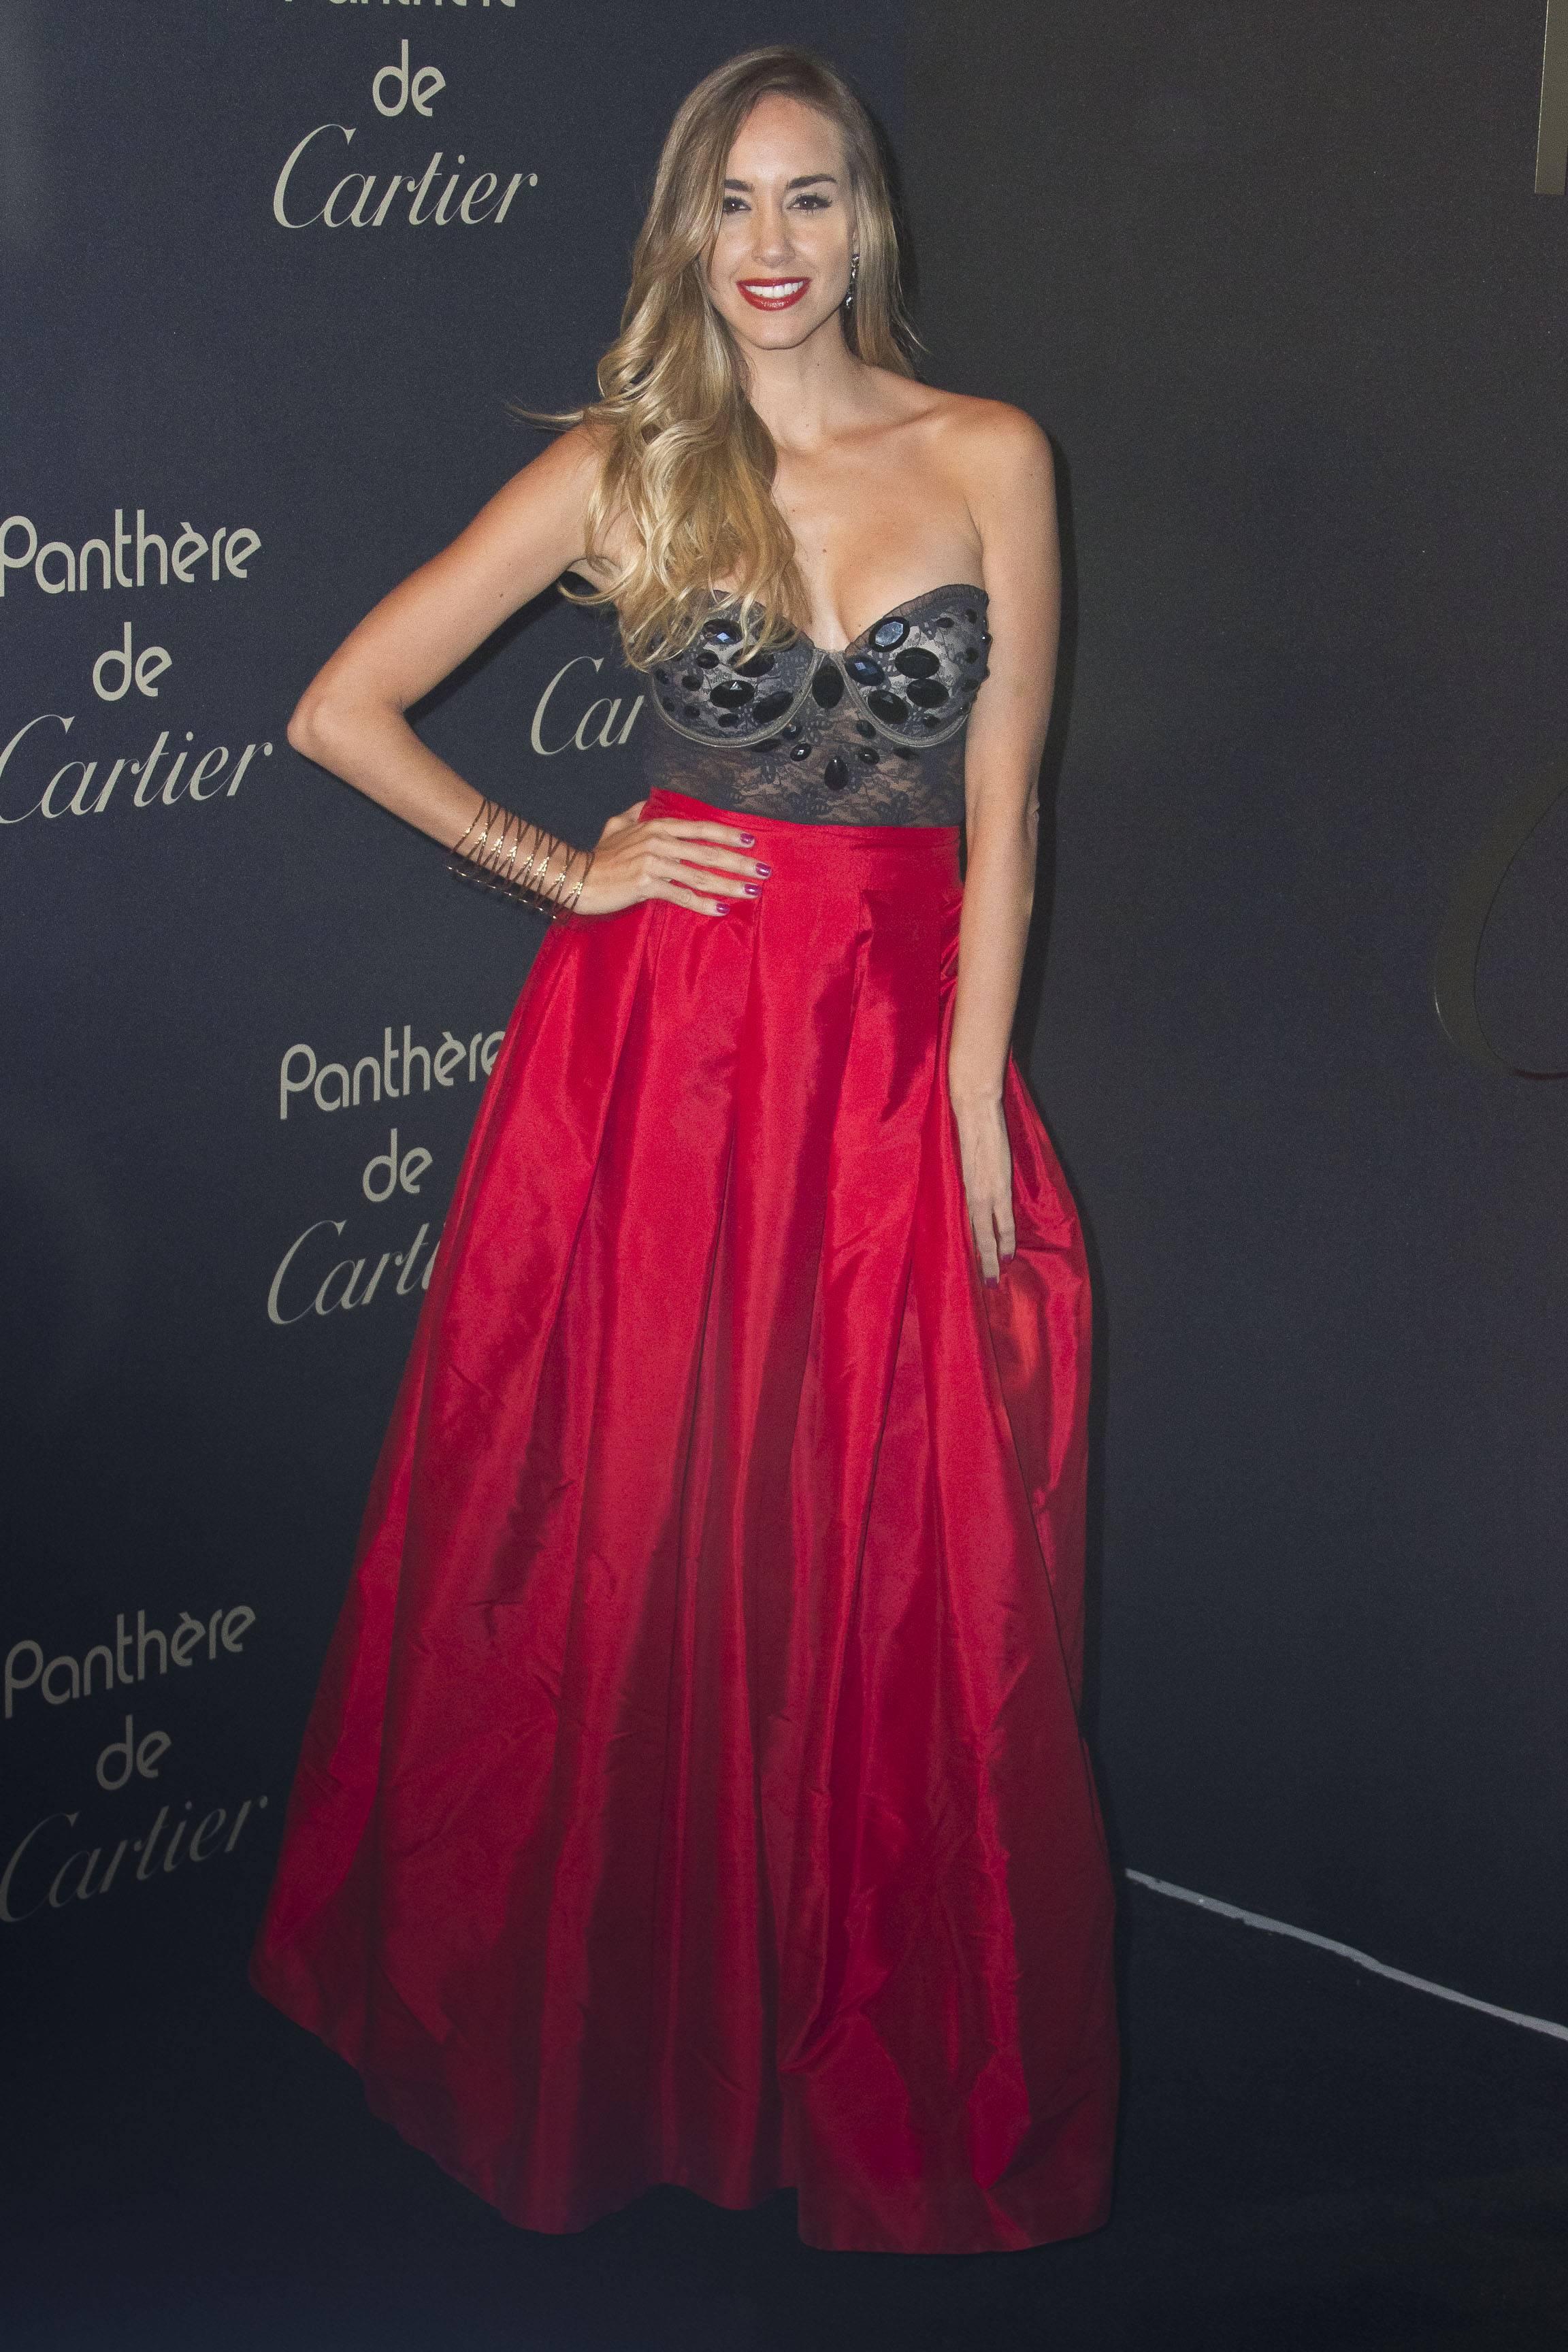 Olivia Peralta JDS